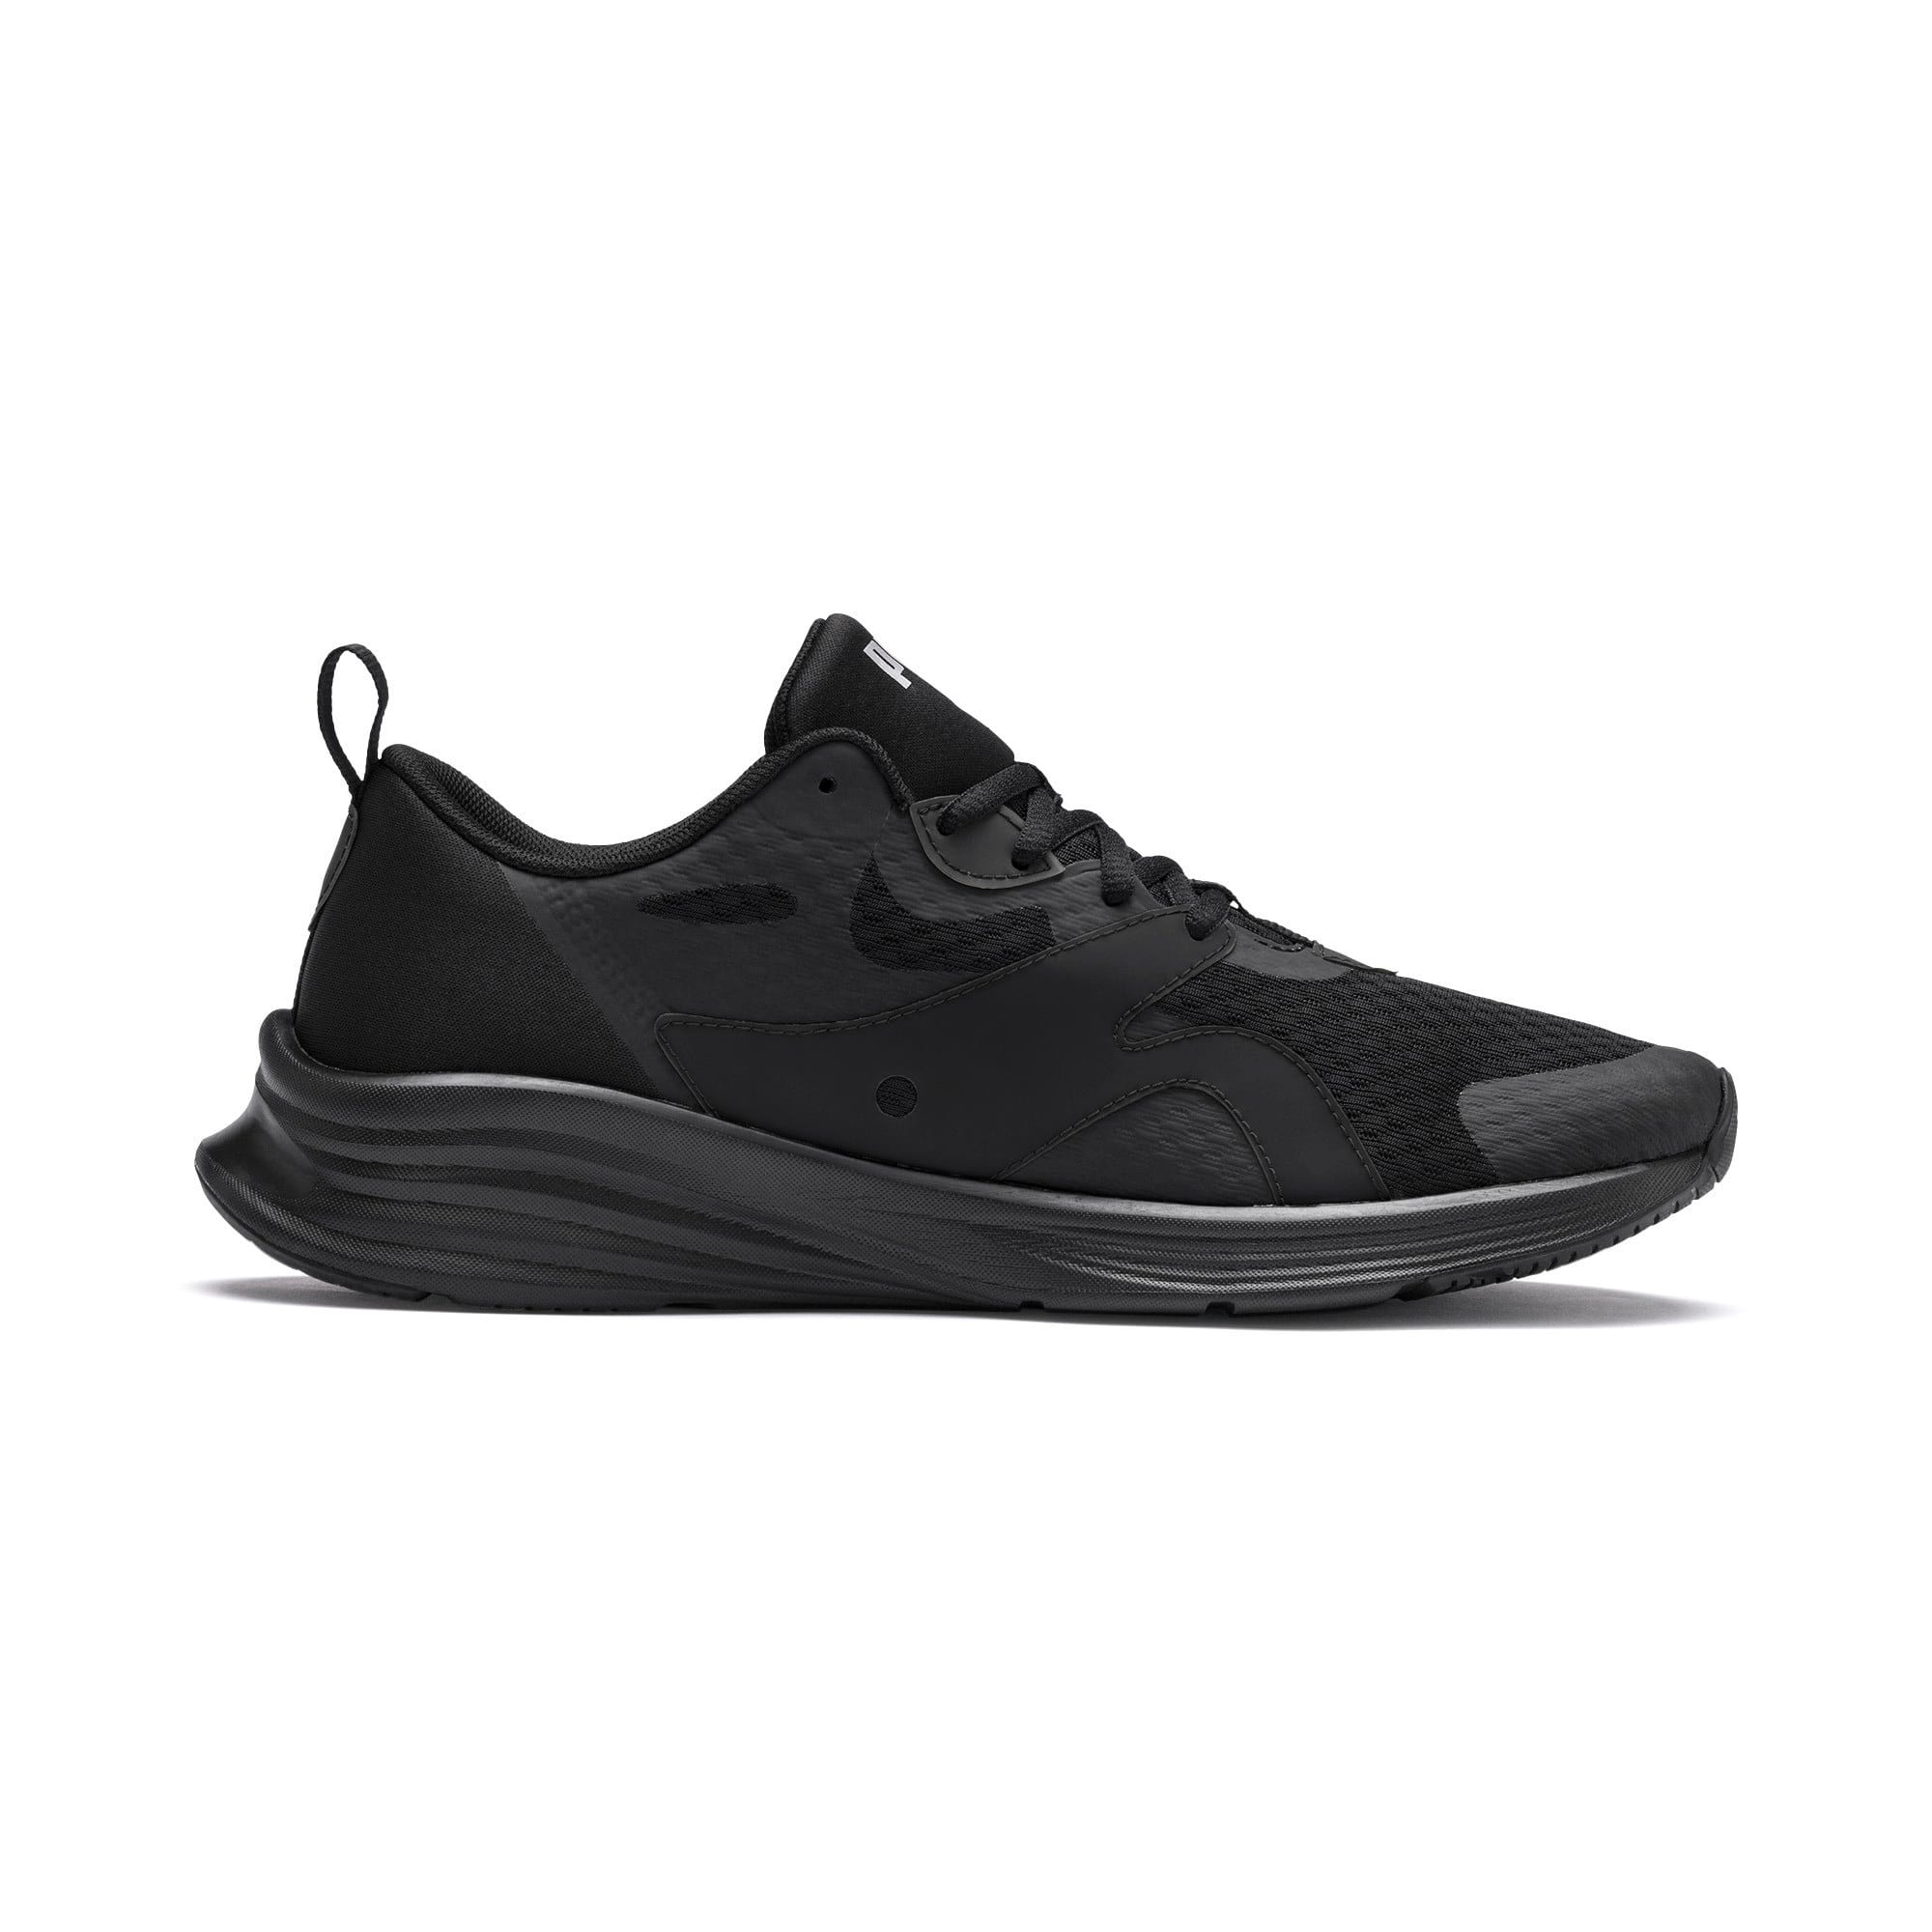 Thumbnail 6 of HYBRID Fuego Men's Running Shoes, Puma Black-Puma Black, medium